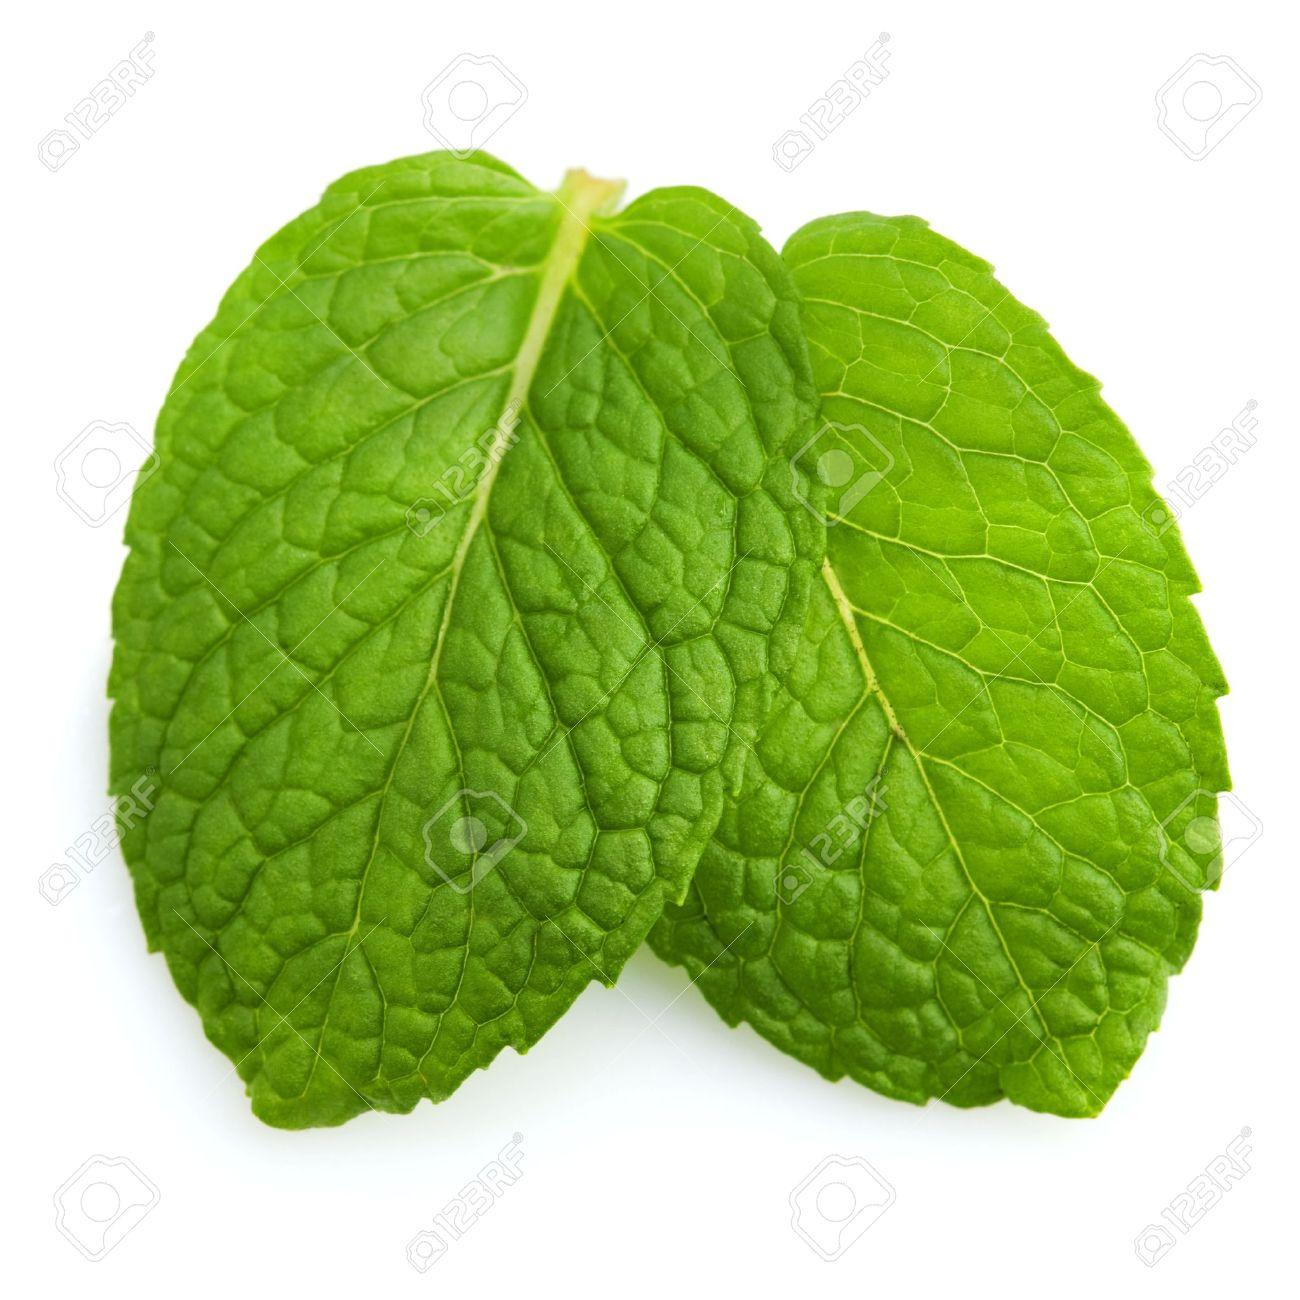 mint leaf images u0026 stock pictures royalty free mint leaf photos